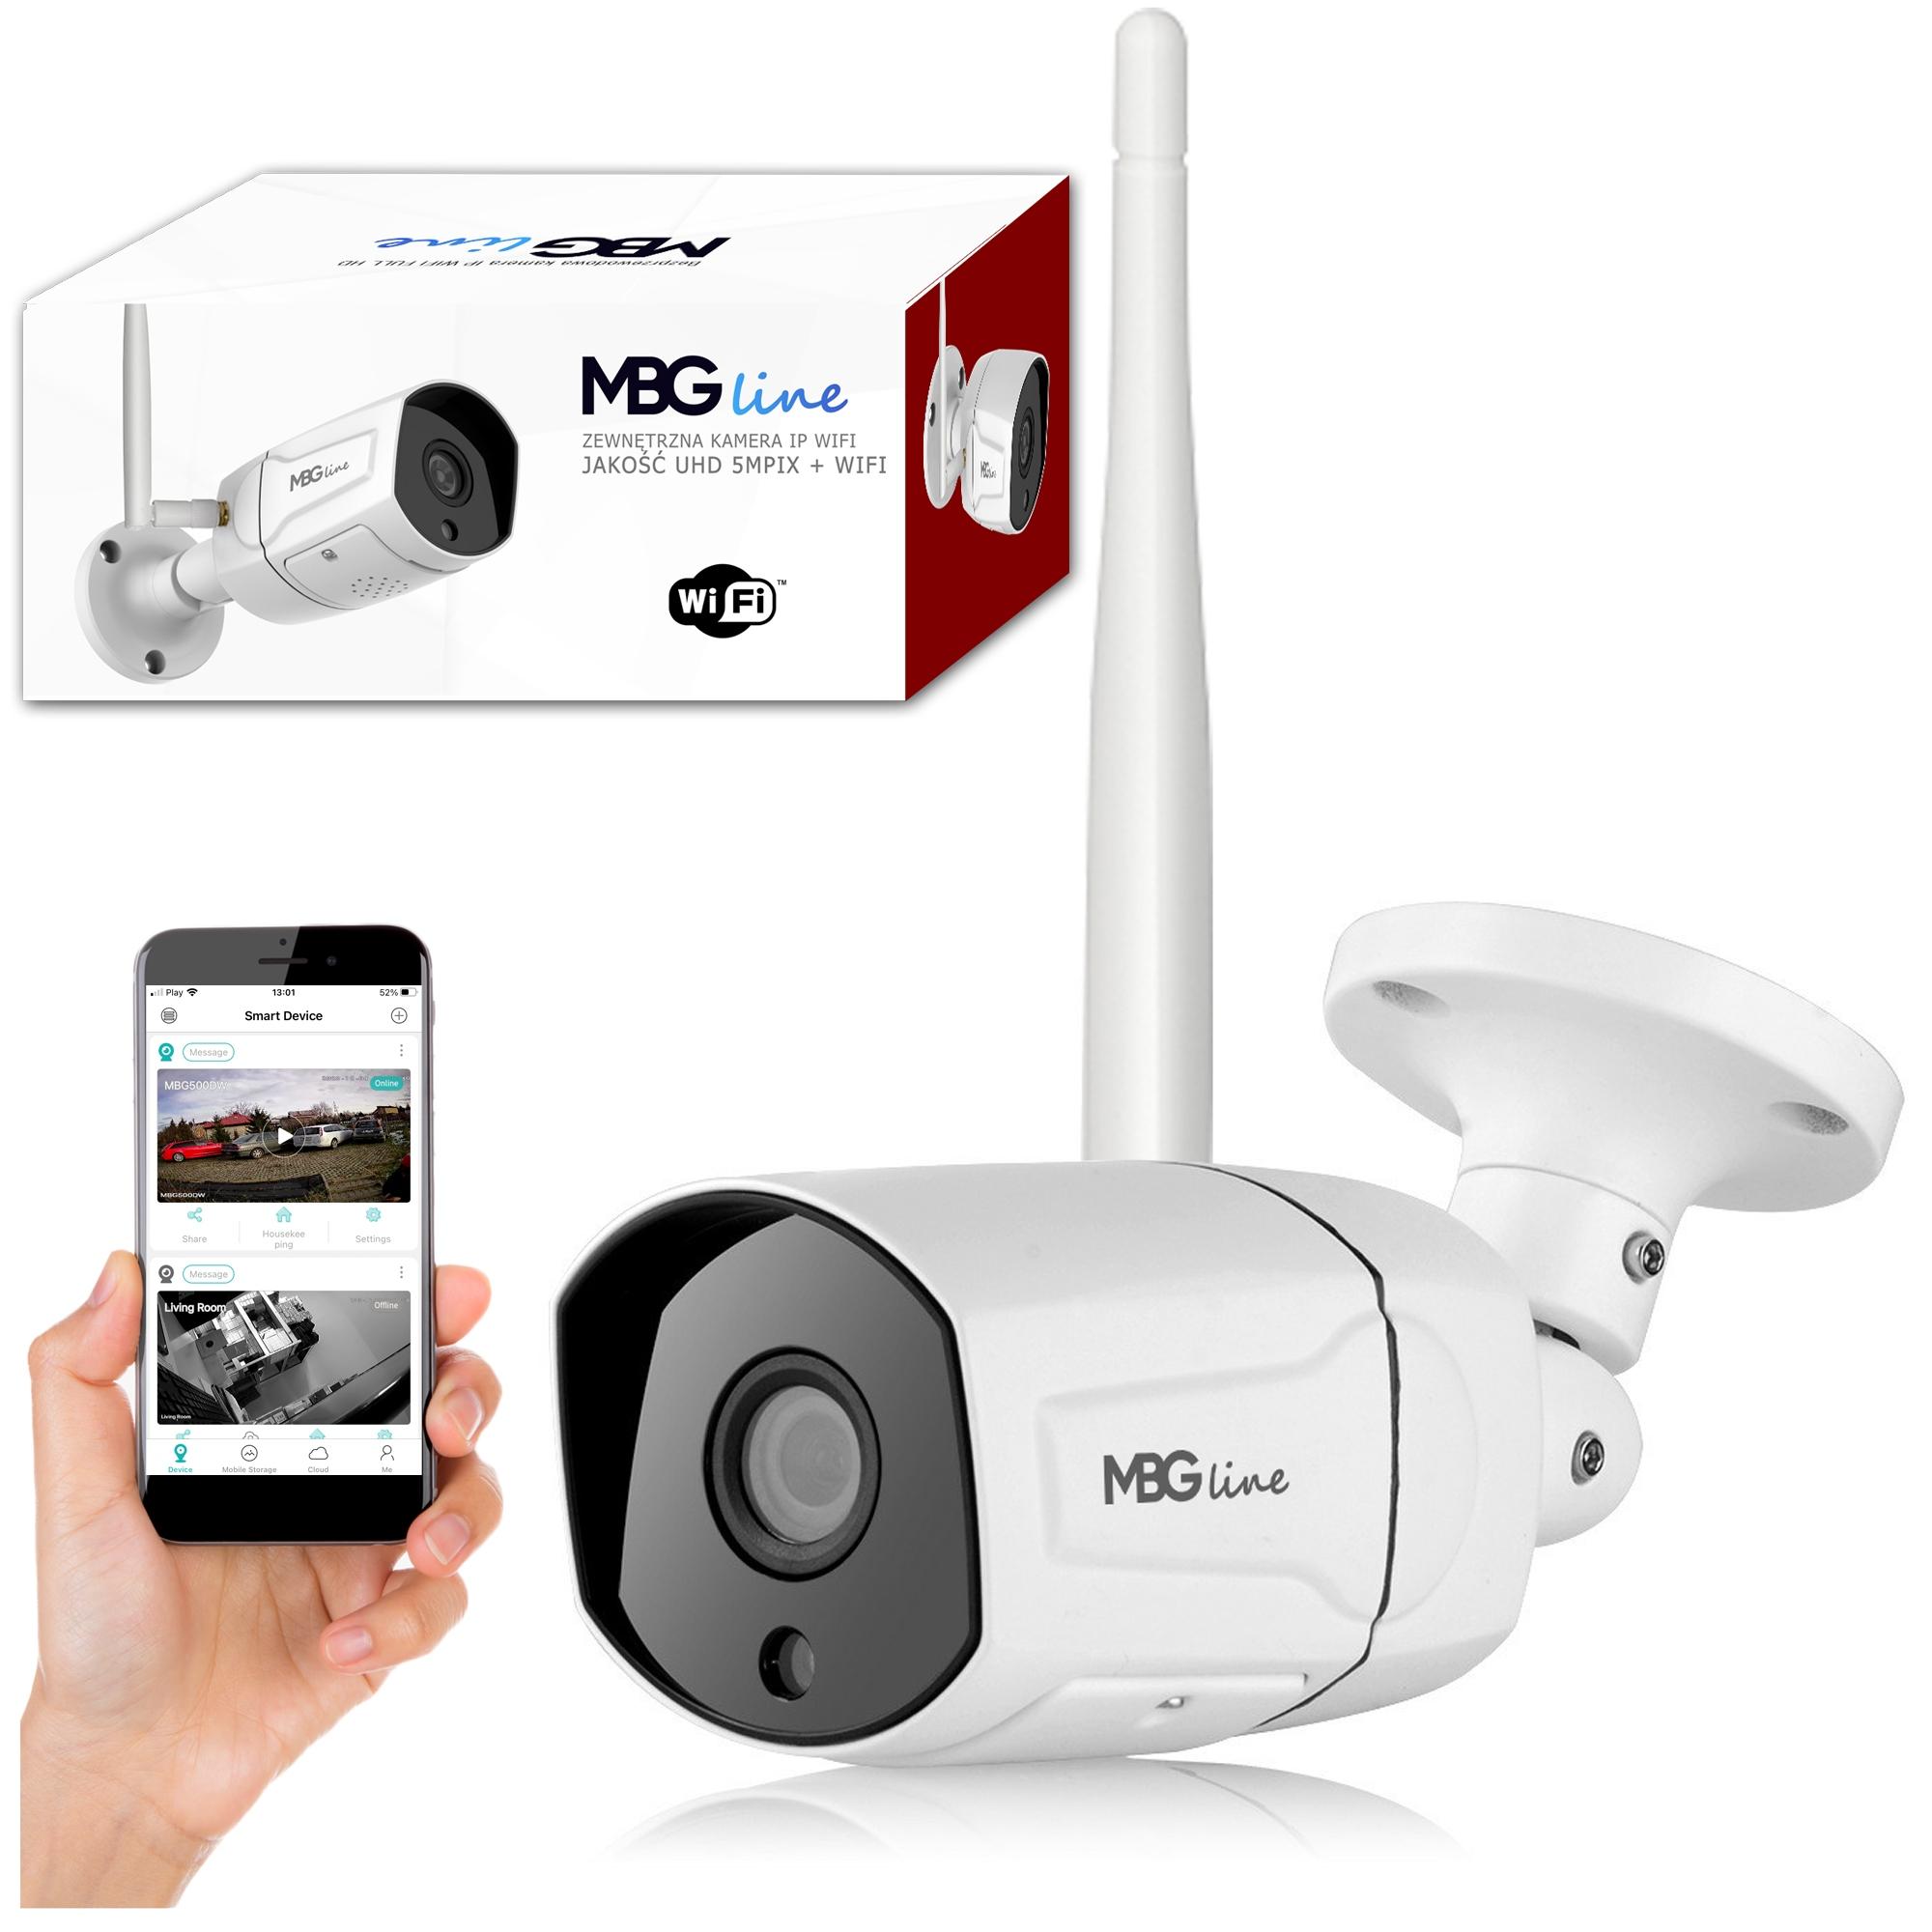 Zewnętrzna kamera IP H265 P2P UHD 5MPIX METAL WIFI